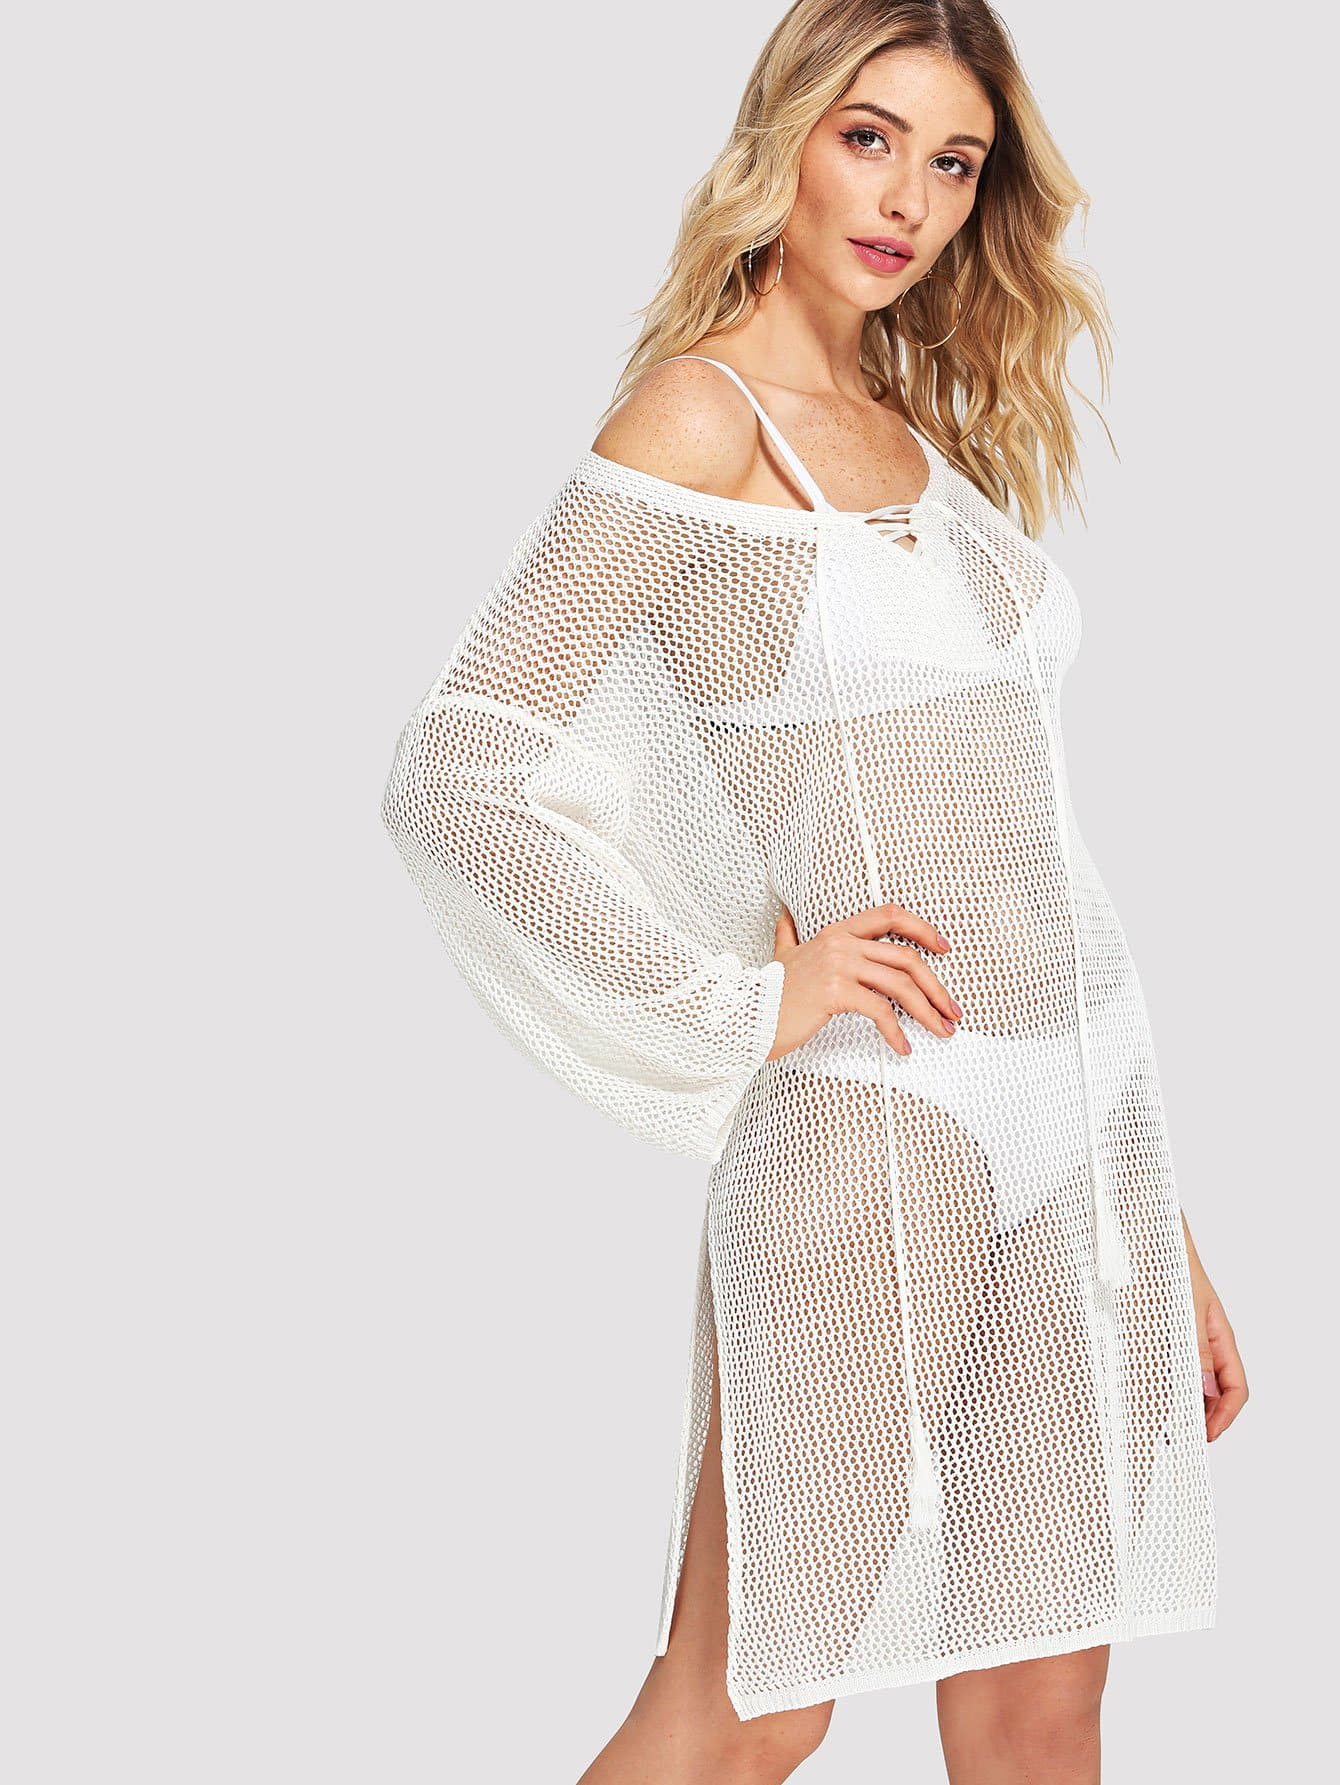 Split Side Lace Up Cover Up Dress split mesh skirt cover up